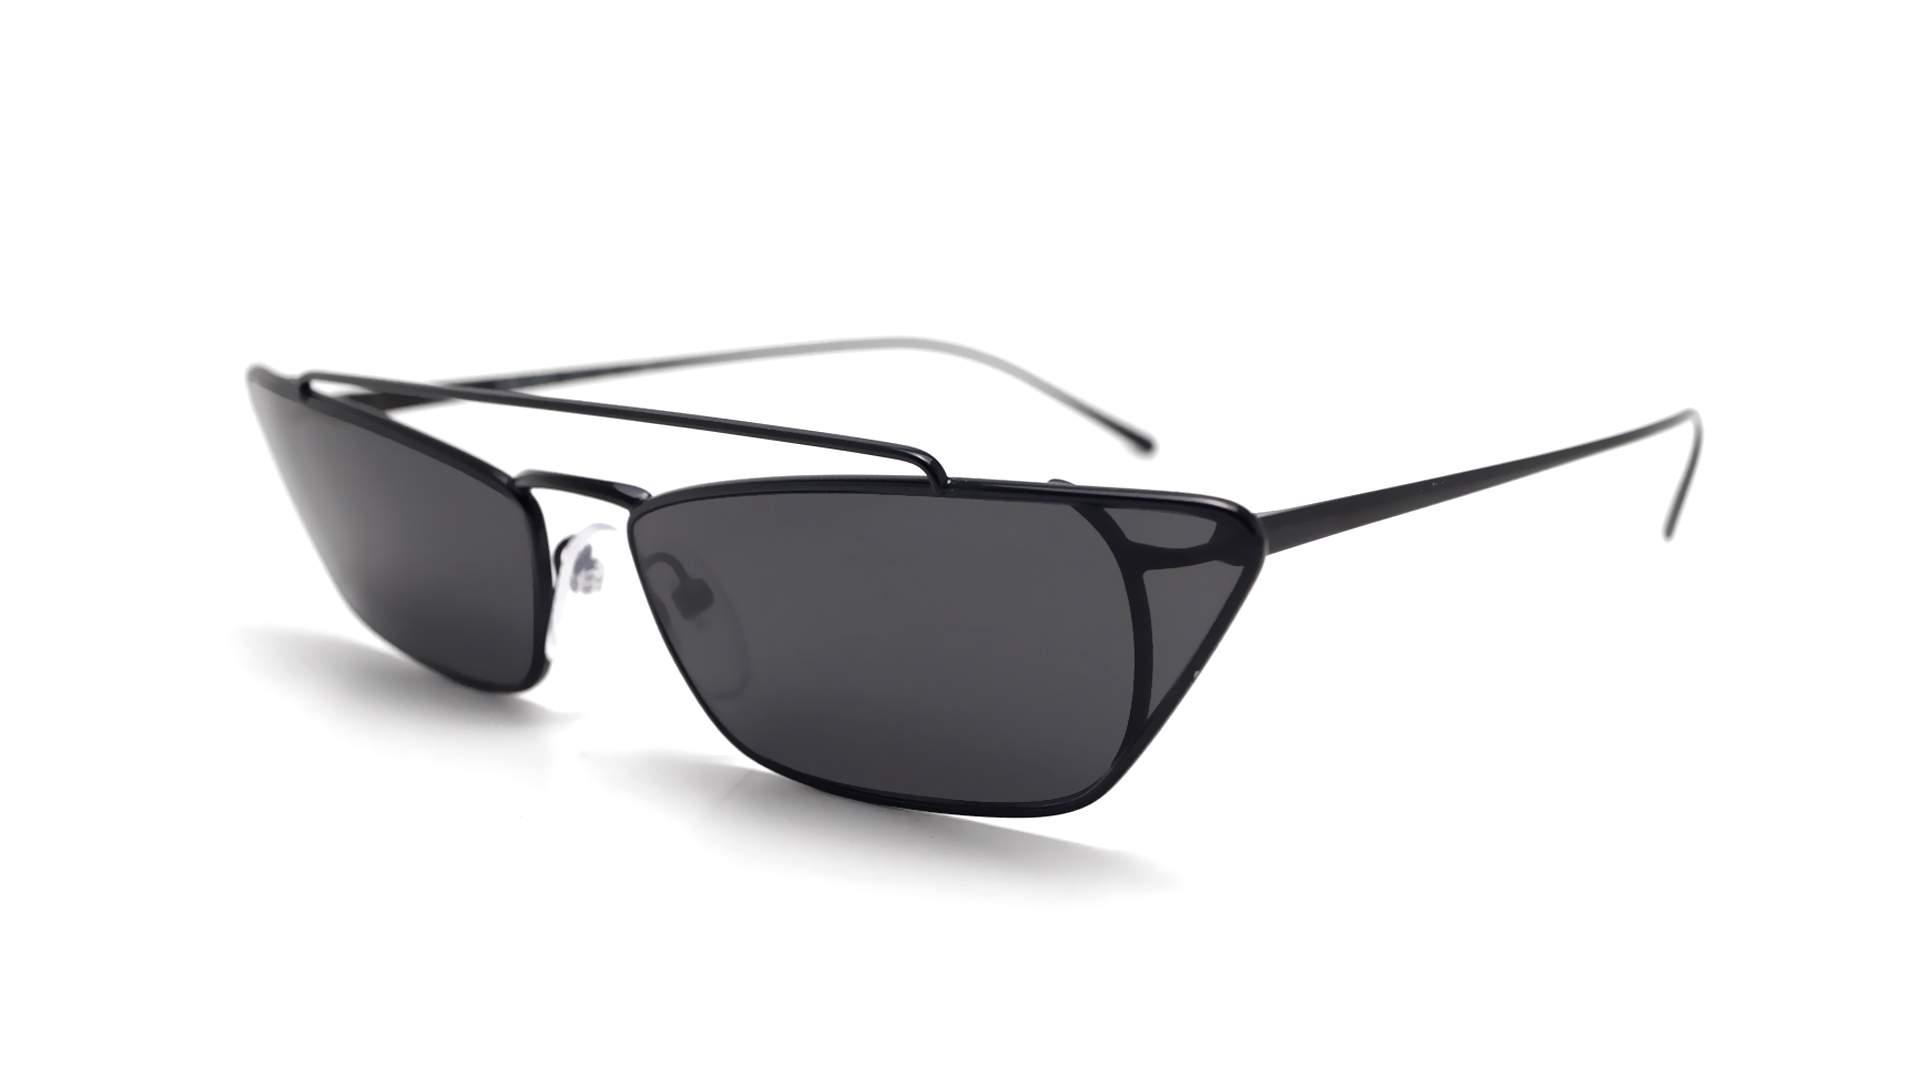 027408b8b08a Sunglasses Prada Ultravox Black PR64US 1AB5S0 67-16 Medium